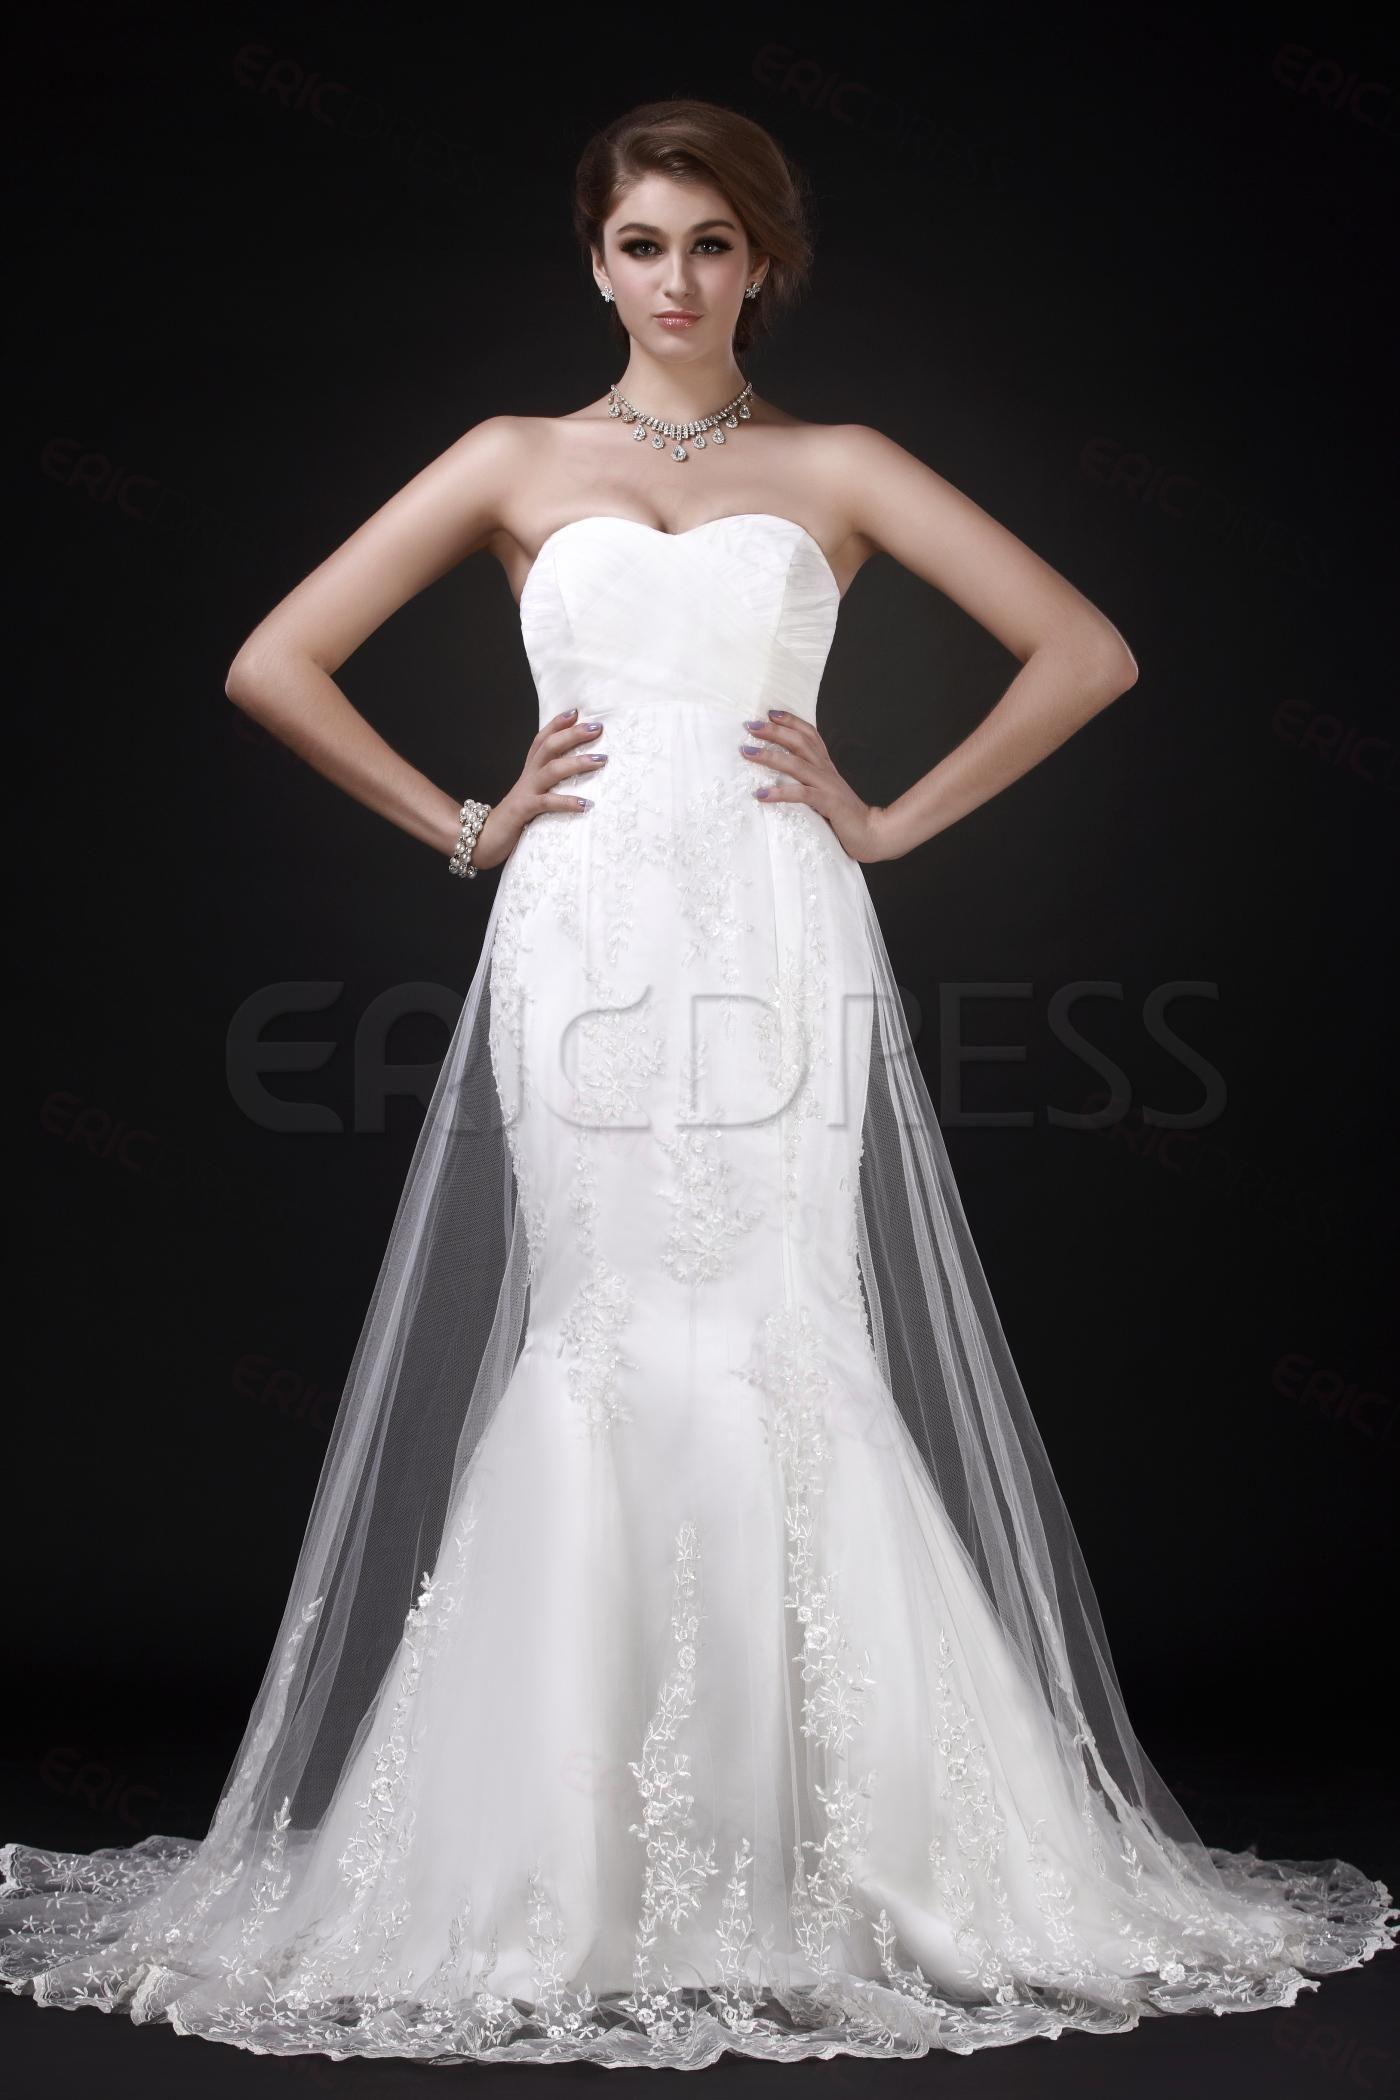 Big girl wedding dresses  Charming MermaidTrumpet Sweetheart Neckline ChapelLength Roxyus